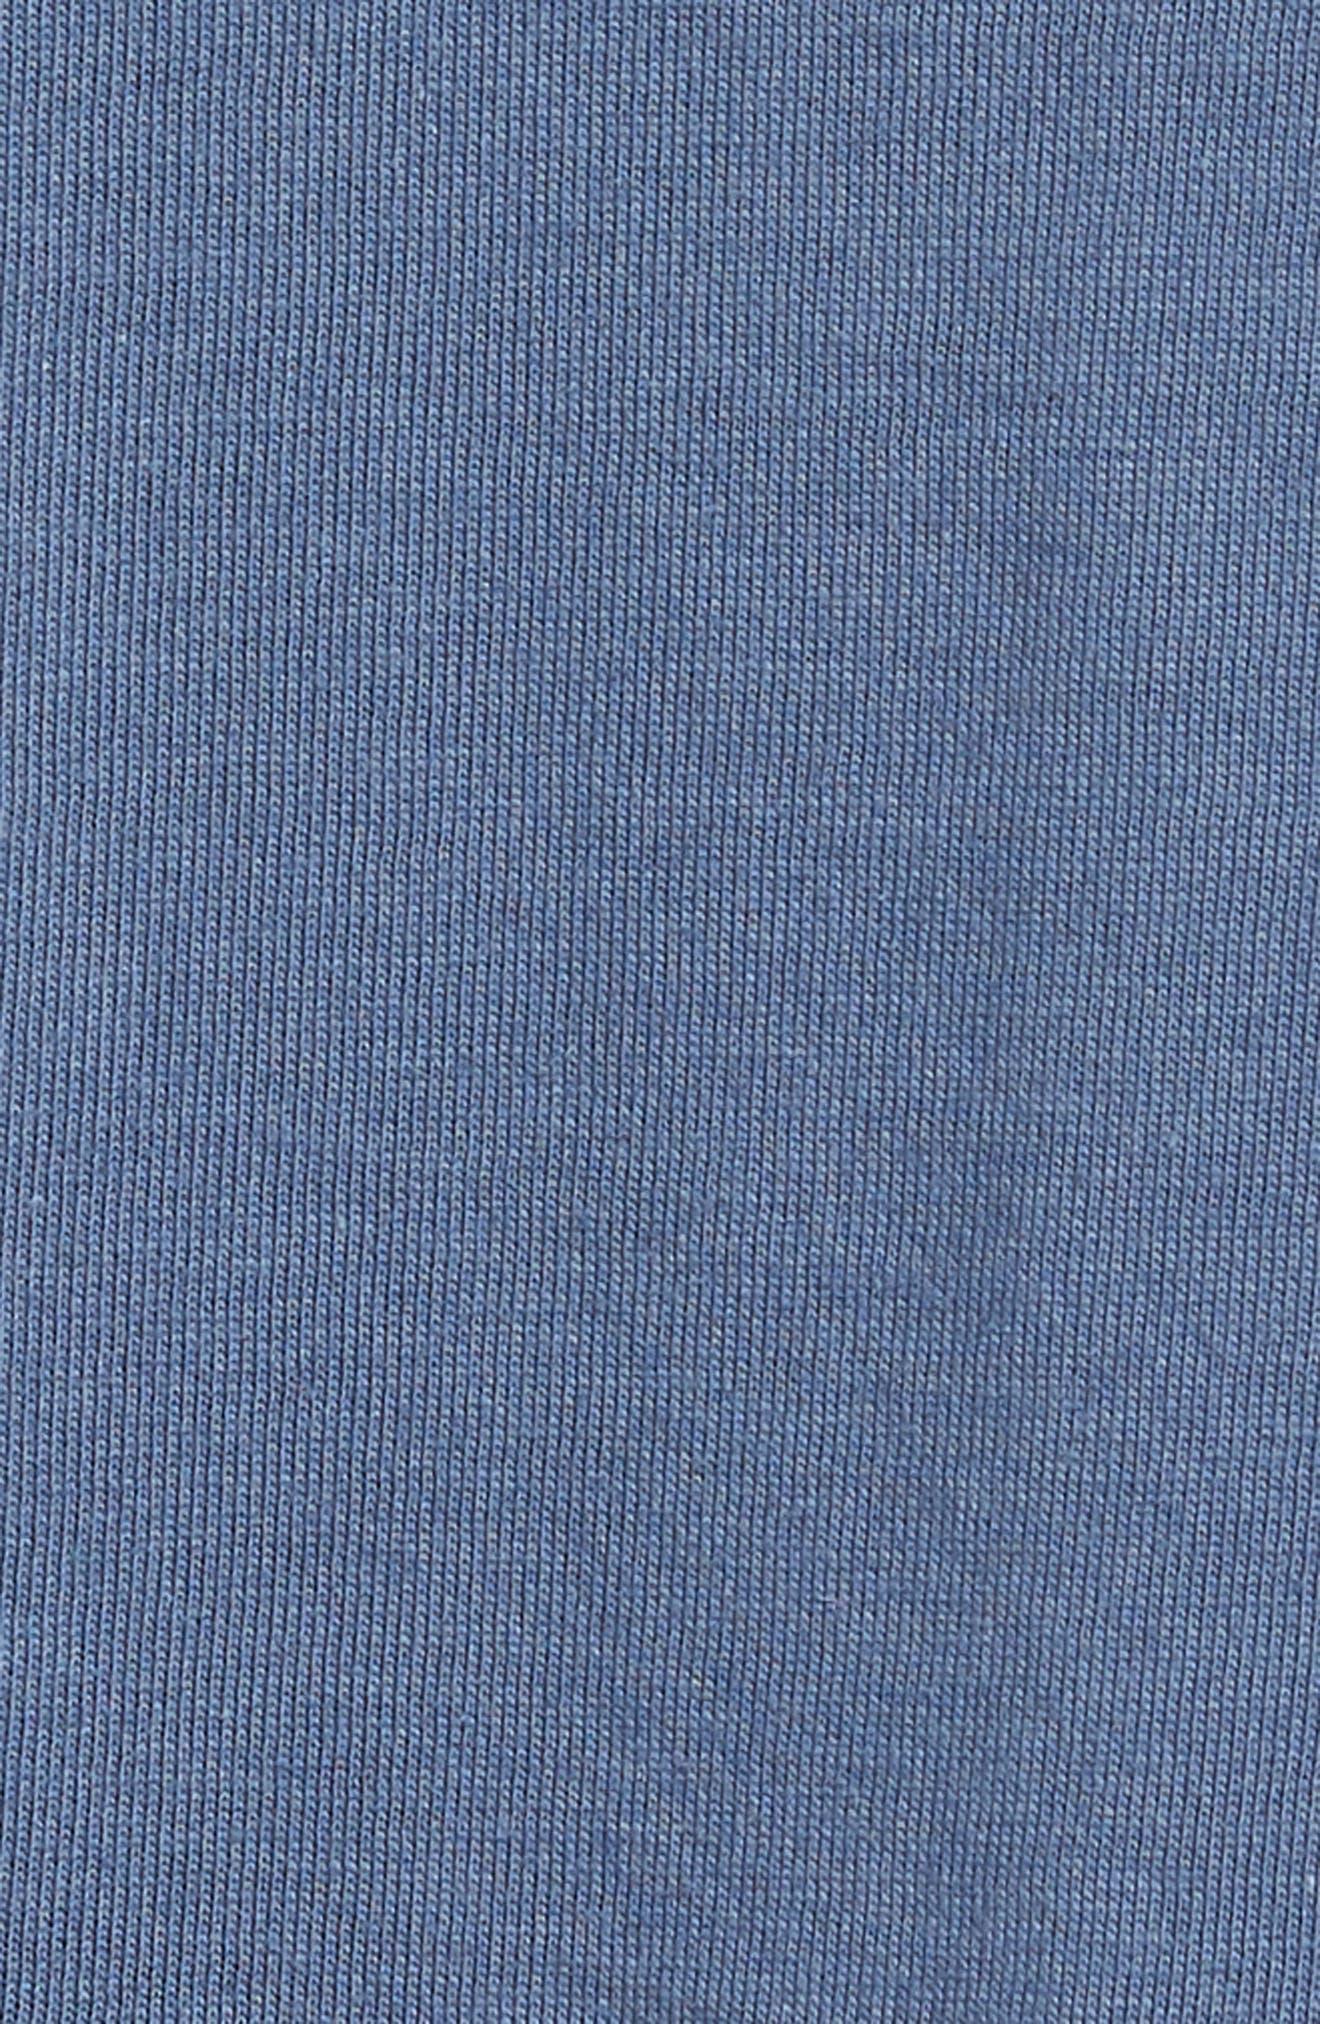 Burch Eye Graphic T-Shirt,                             Alternate thumbnail 5, color,